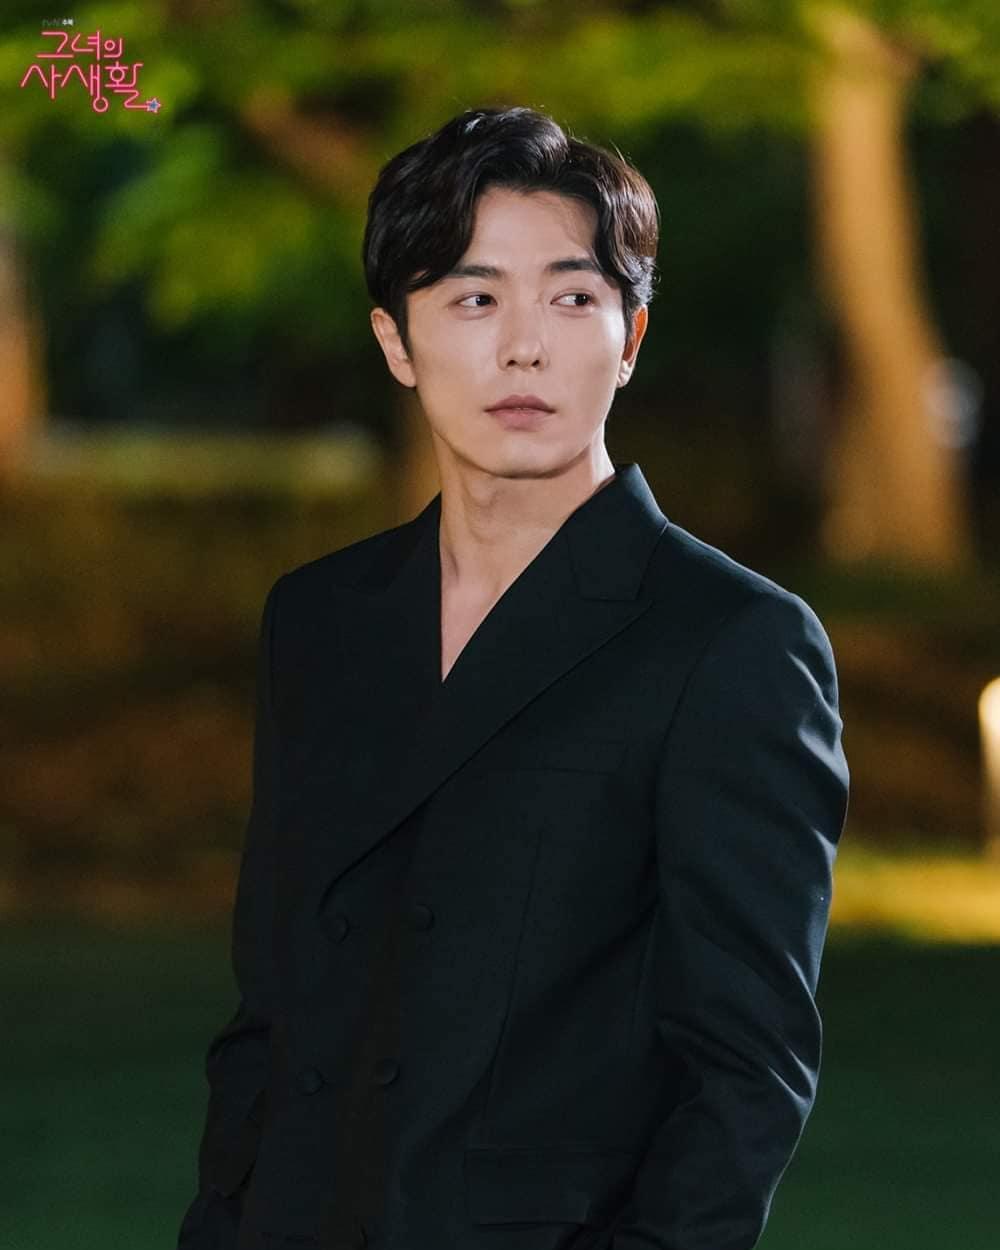 Cuma Drama Korea yang Bisa Menyulap 6 Karakter Fantasi Ini